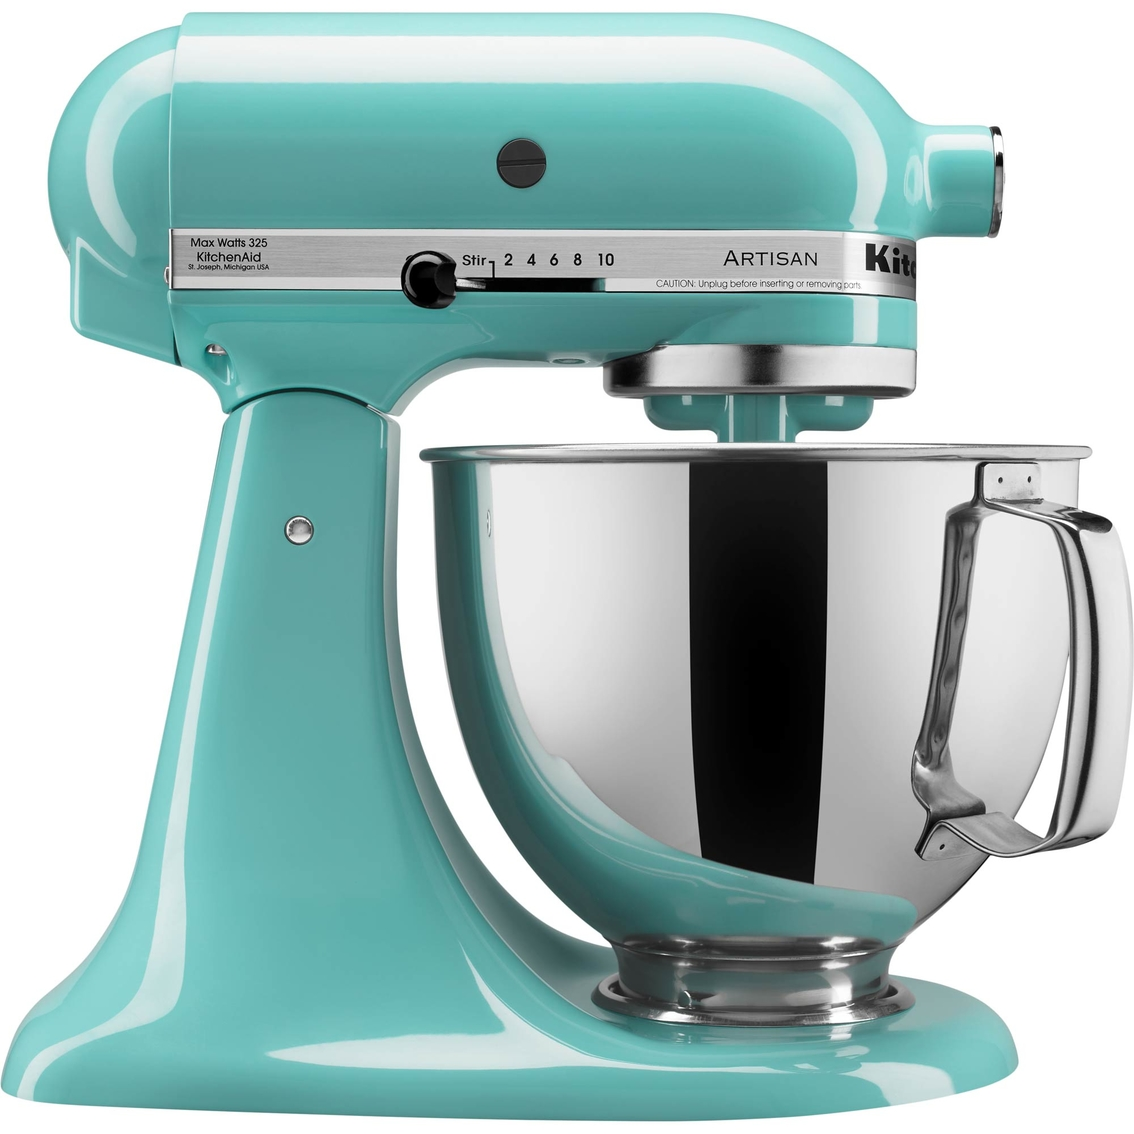 Kitchenaid Artisan 5 Qt. Stand Mixer | Kitchenaid | Shop The Exchange